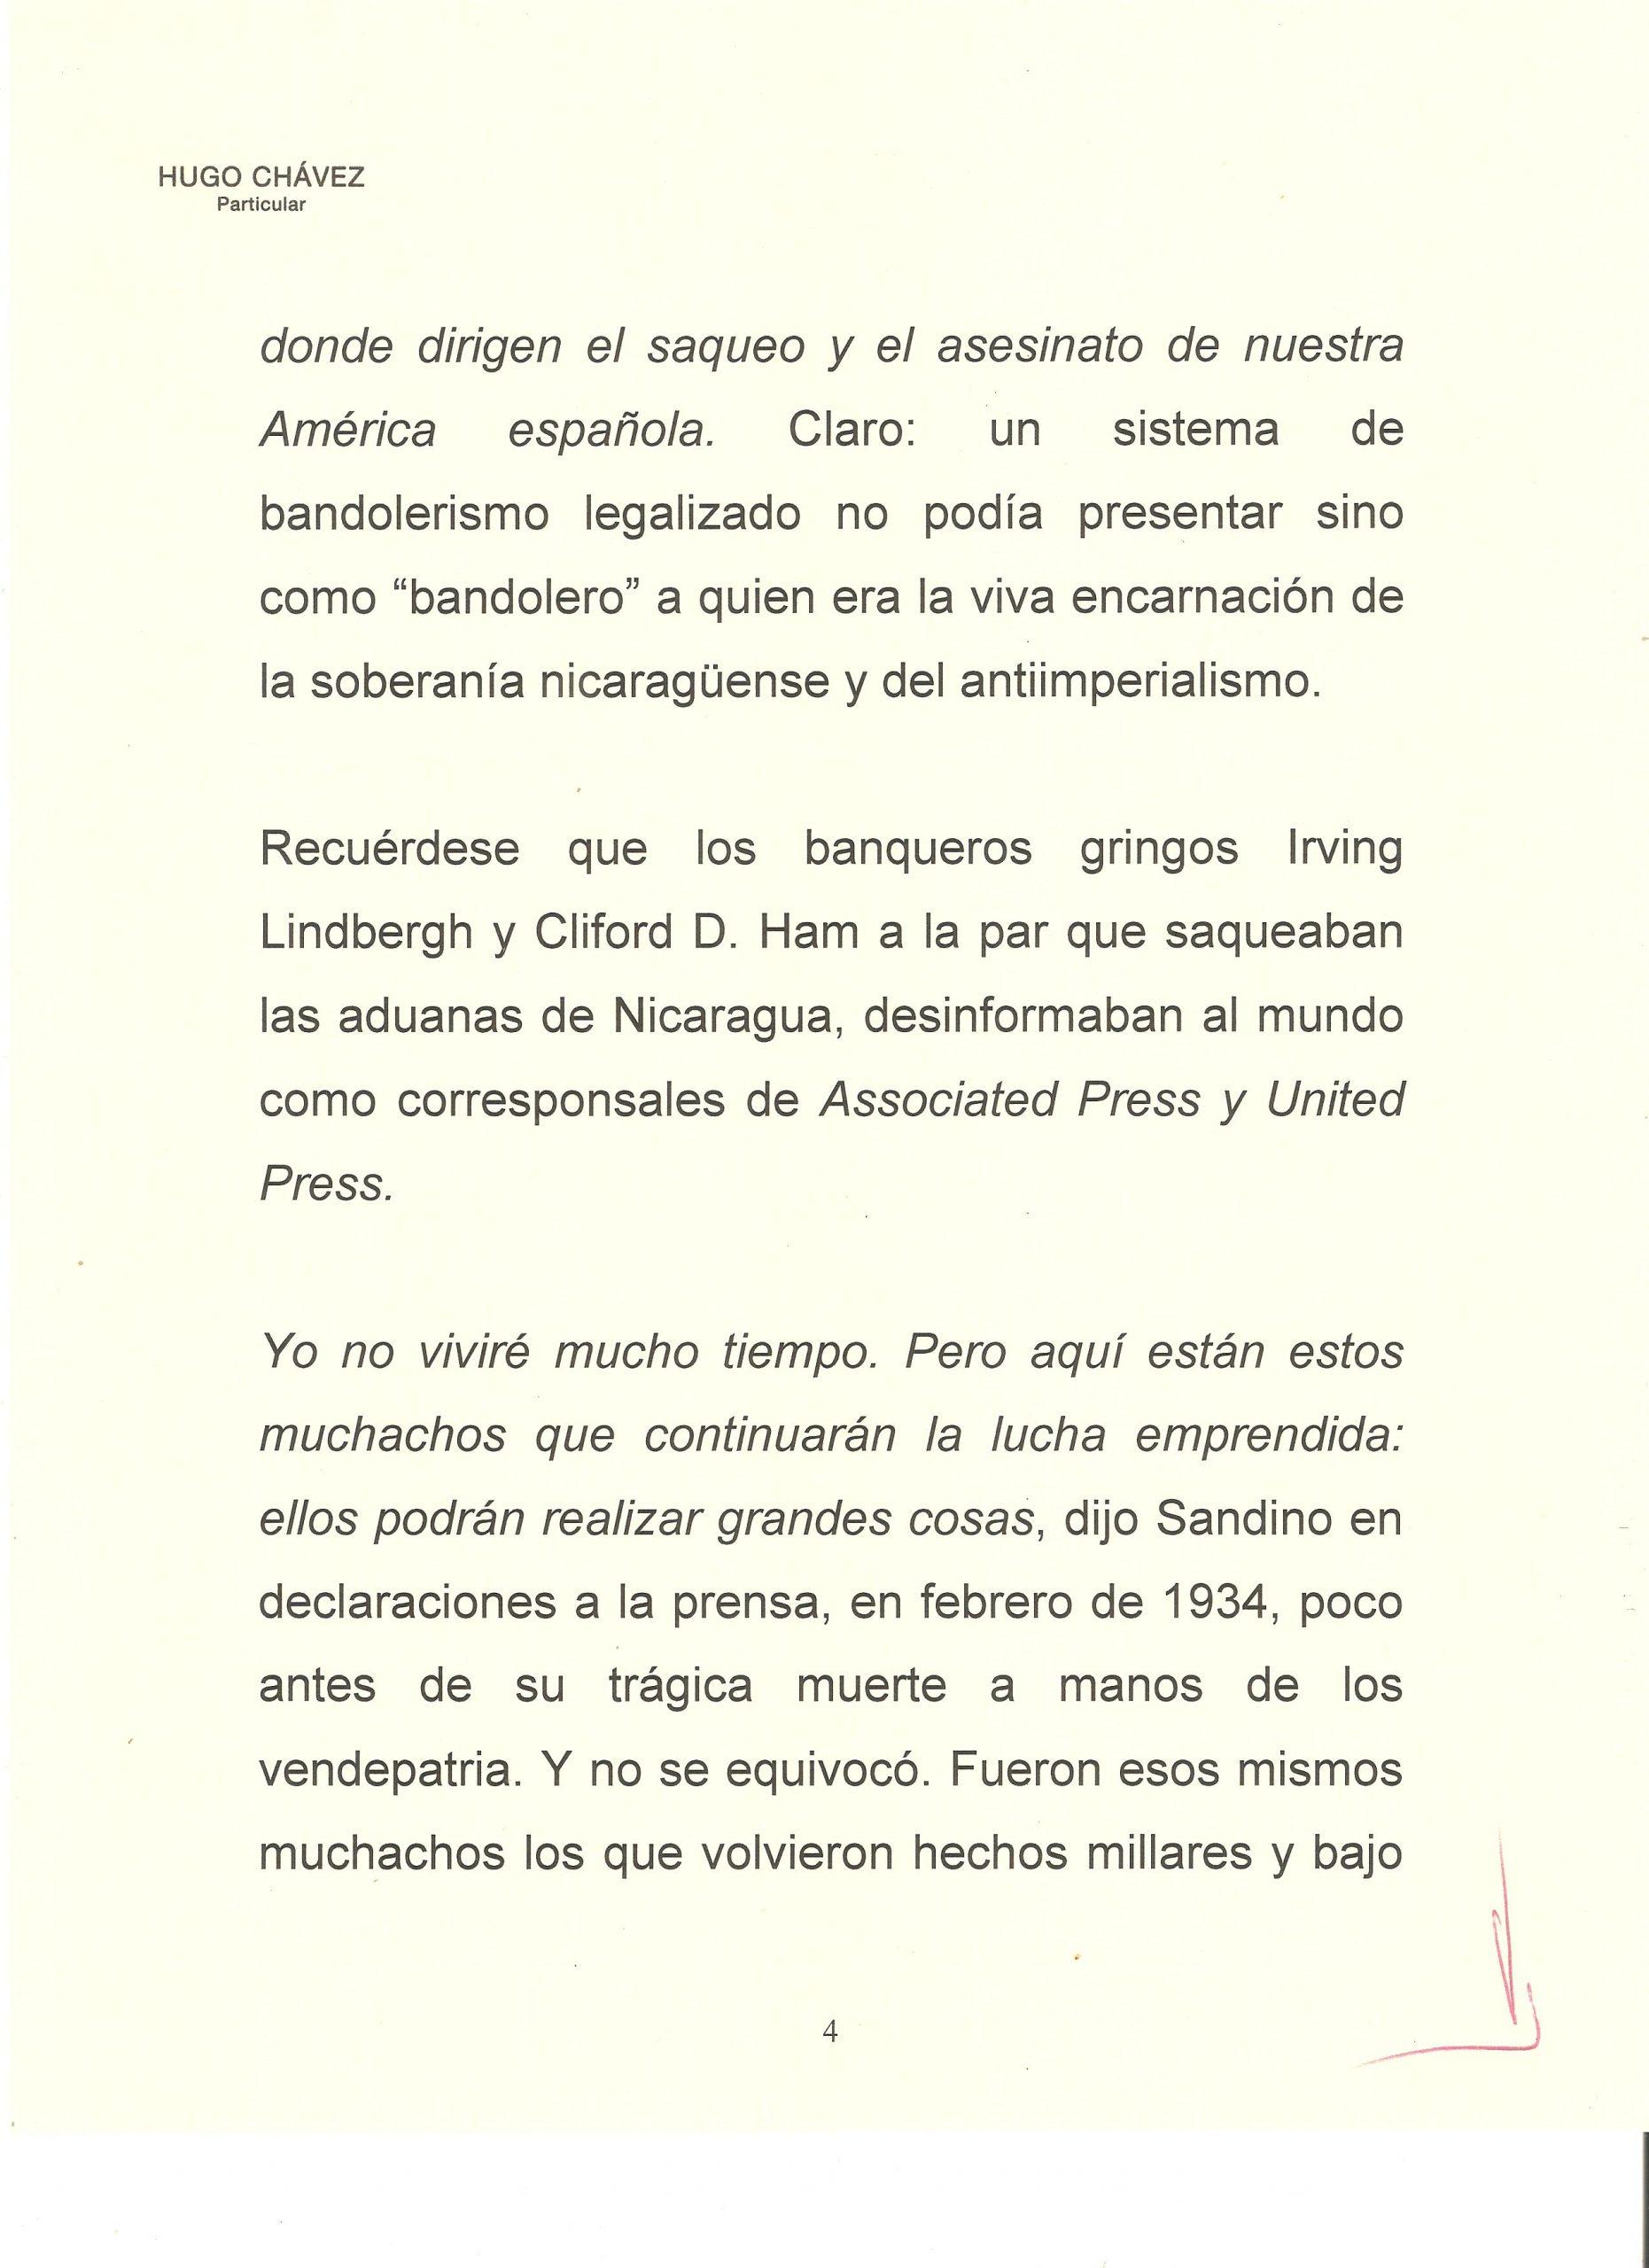 PROLOGO DE HUGO CHAVEZ A WALTER 4